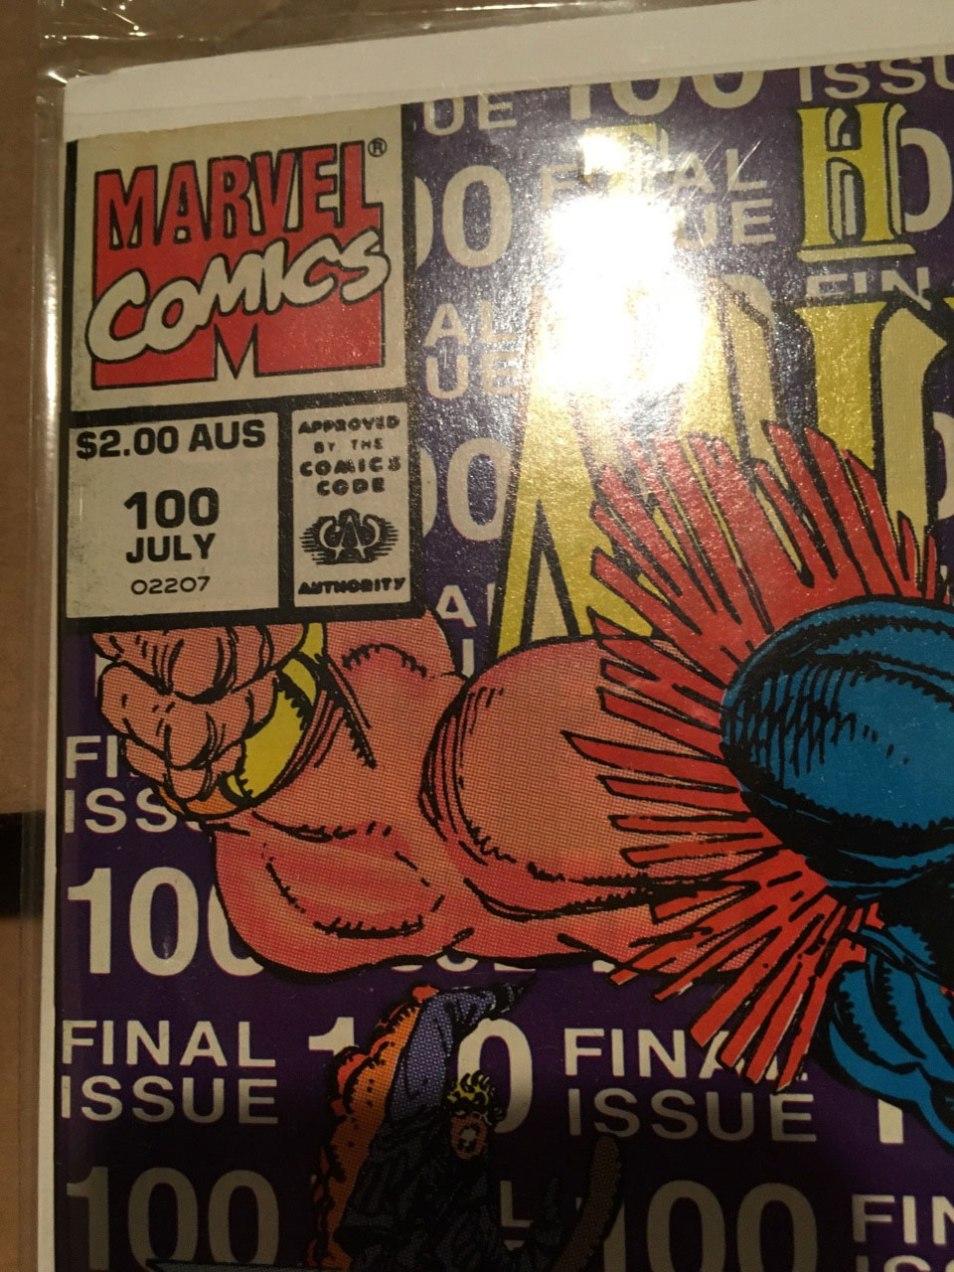 New Mutants #100, $2.00 AUS variant